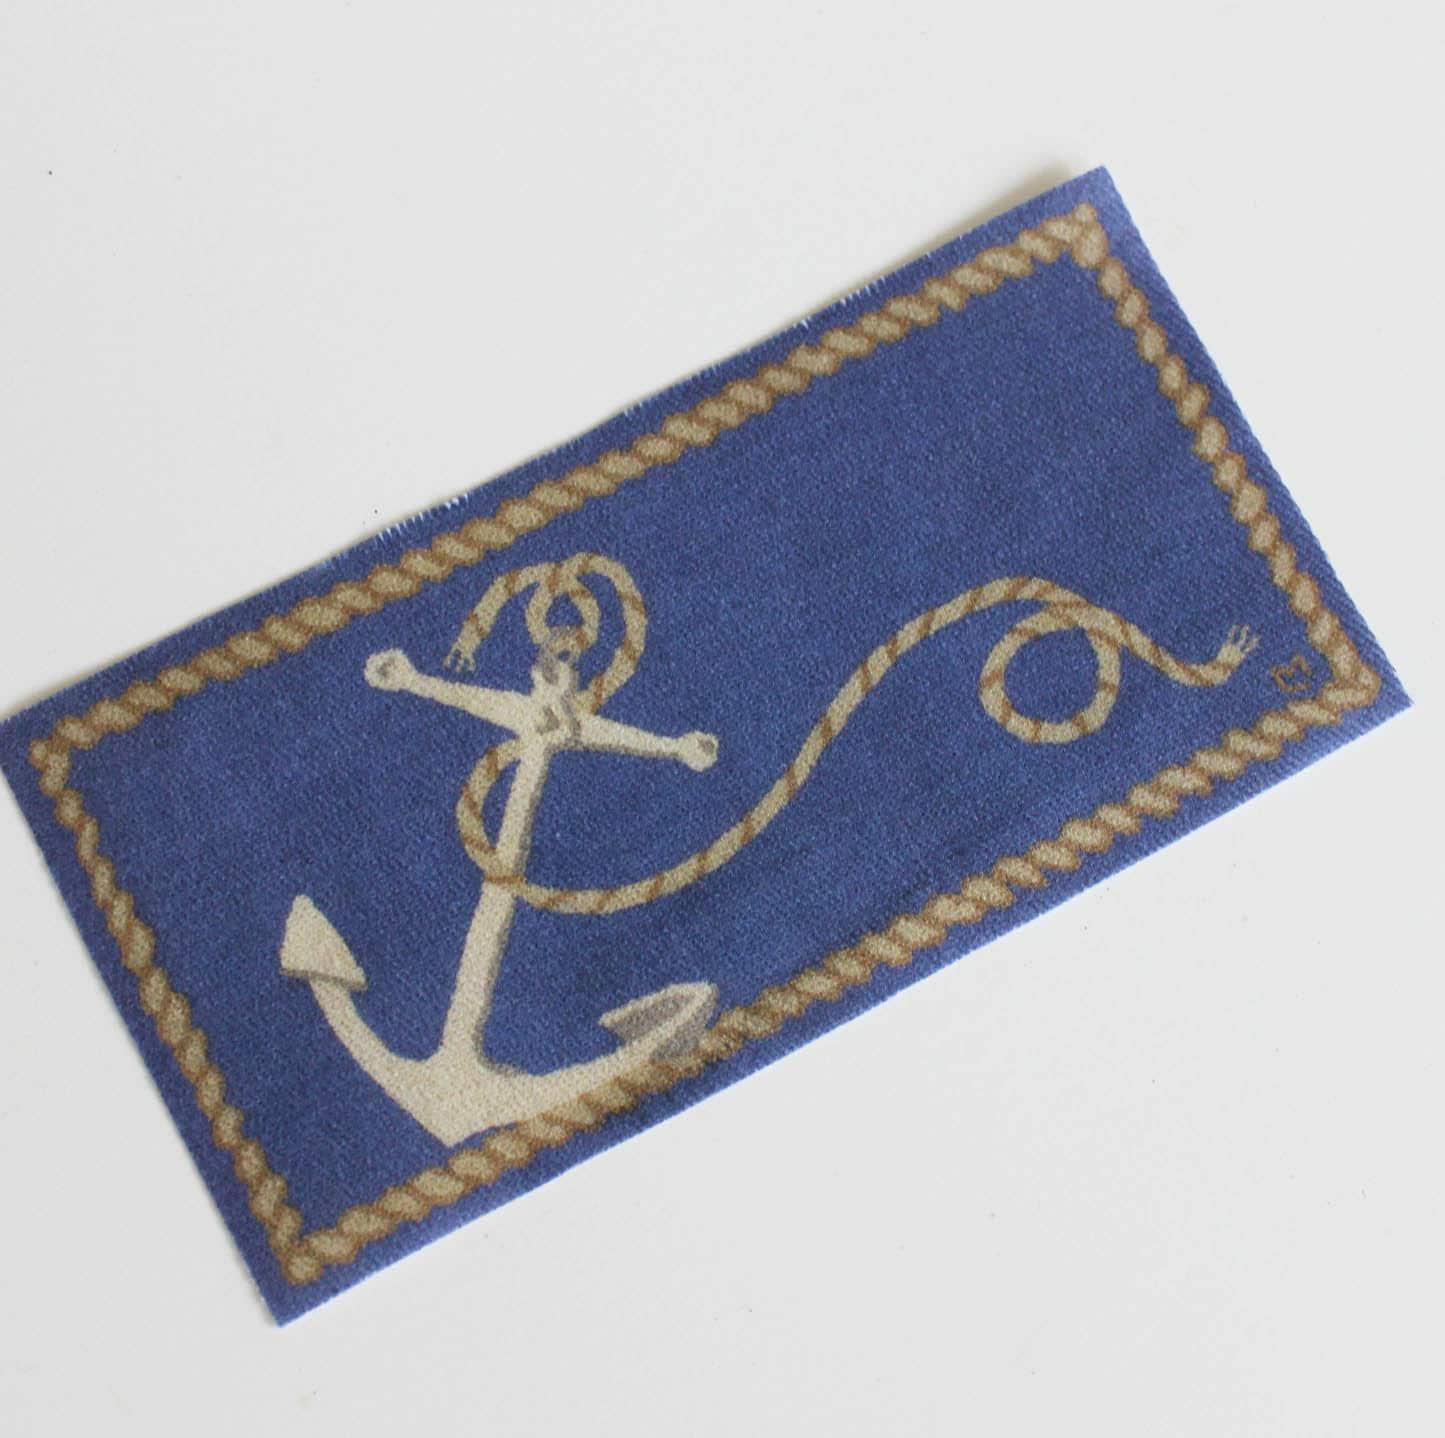 Nautical Blue Rug: Miniature Blue Rug Nautical Anchors Aweigh Rectangular In